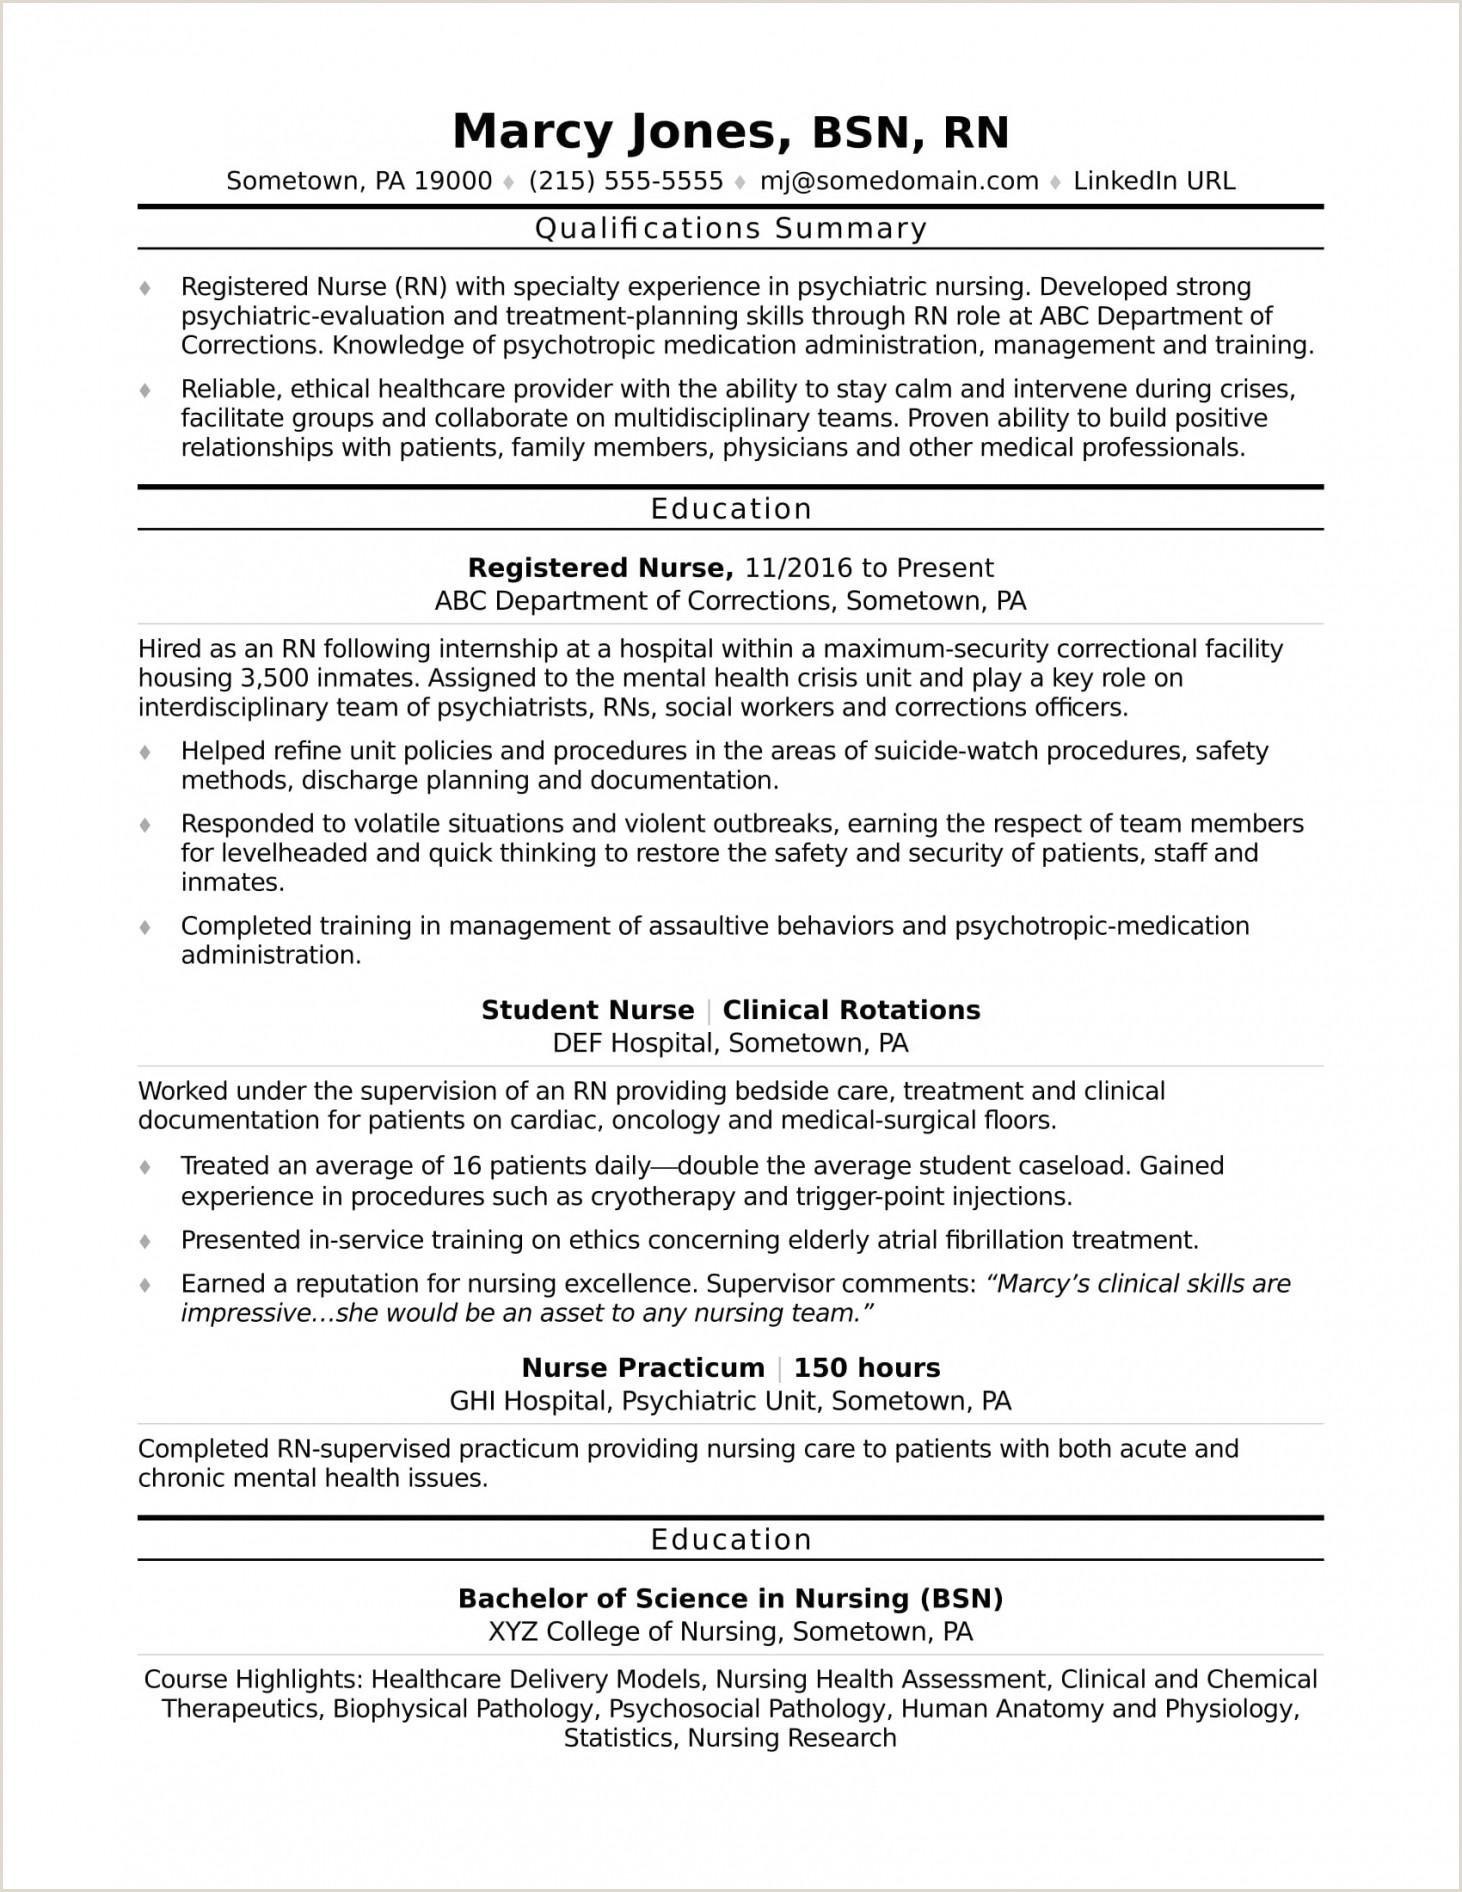 Current Nursing Student Resume Nursing Experience